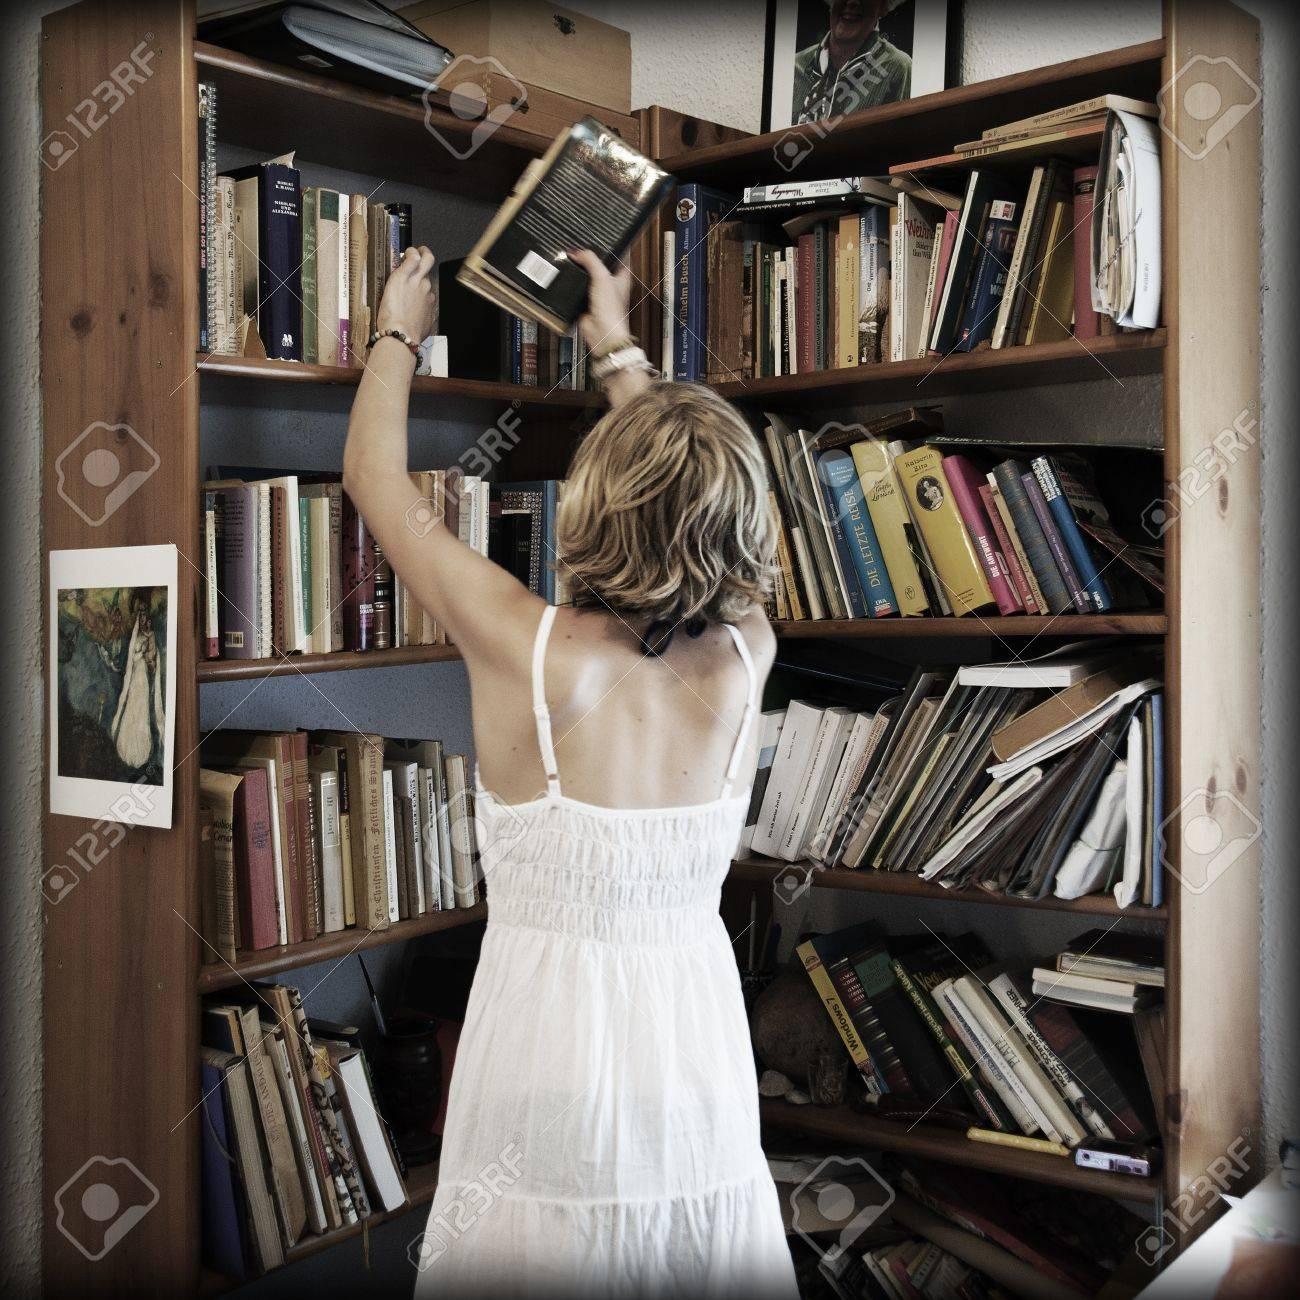 Chica rubia ordenar la biblioteca Foto de archivo - 14755144